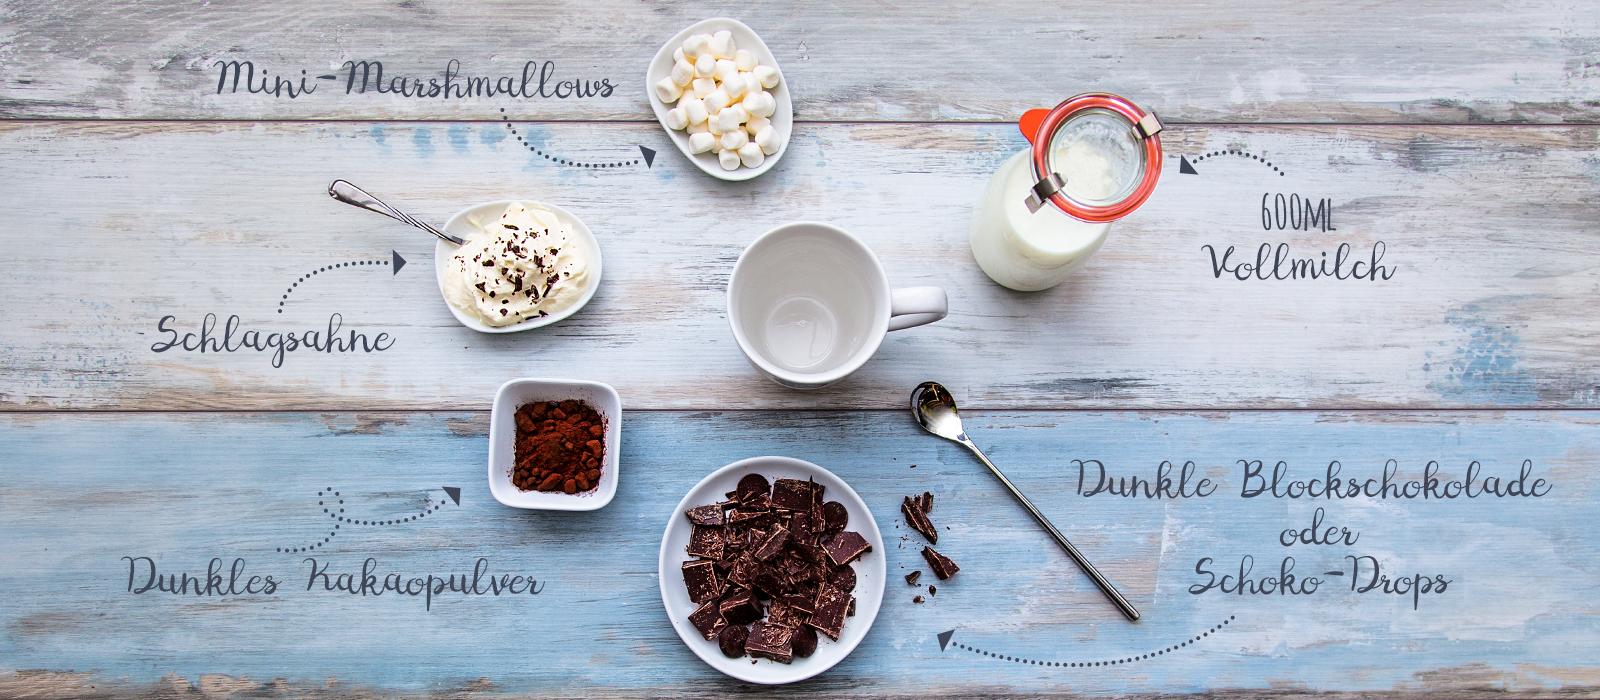 Géramont Getränke Zutaten Kakao